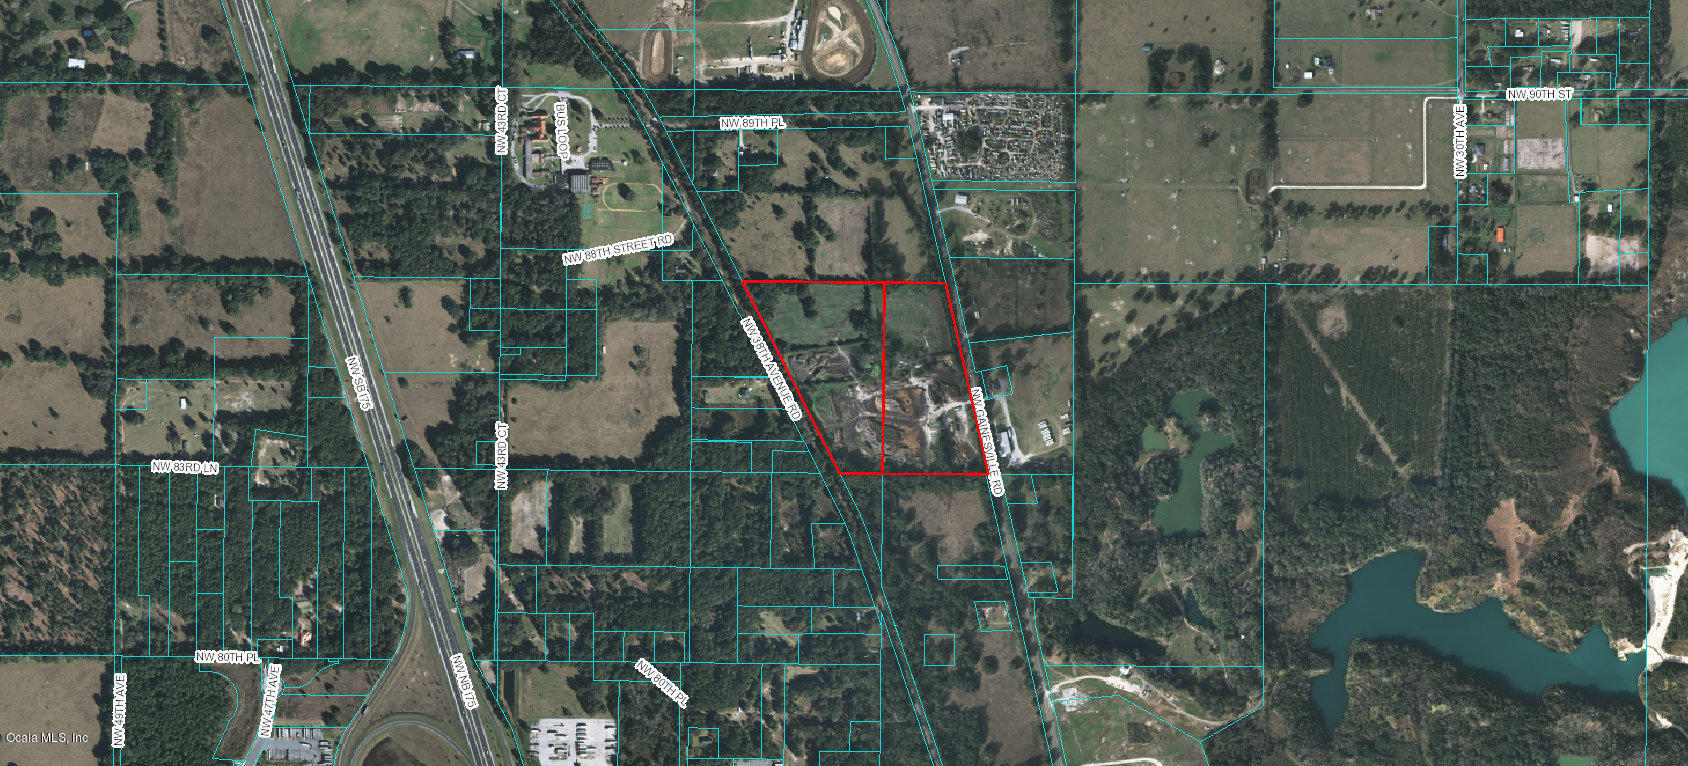 36 77 Acre Ocala, Florida Land for Sale – OHP5395 – Ocala